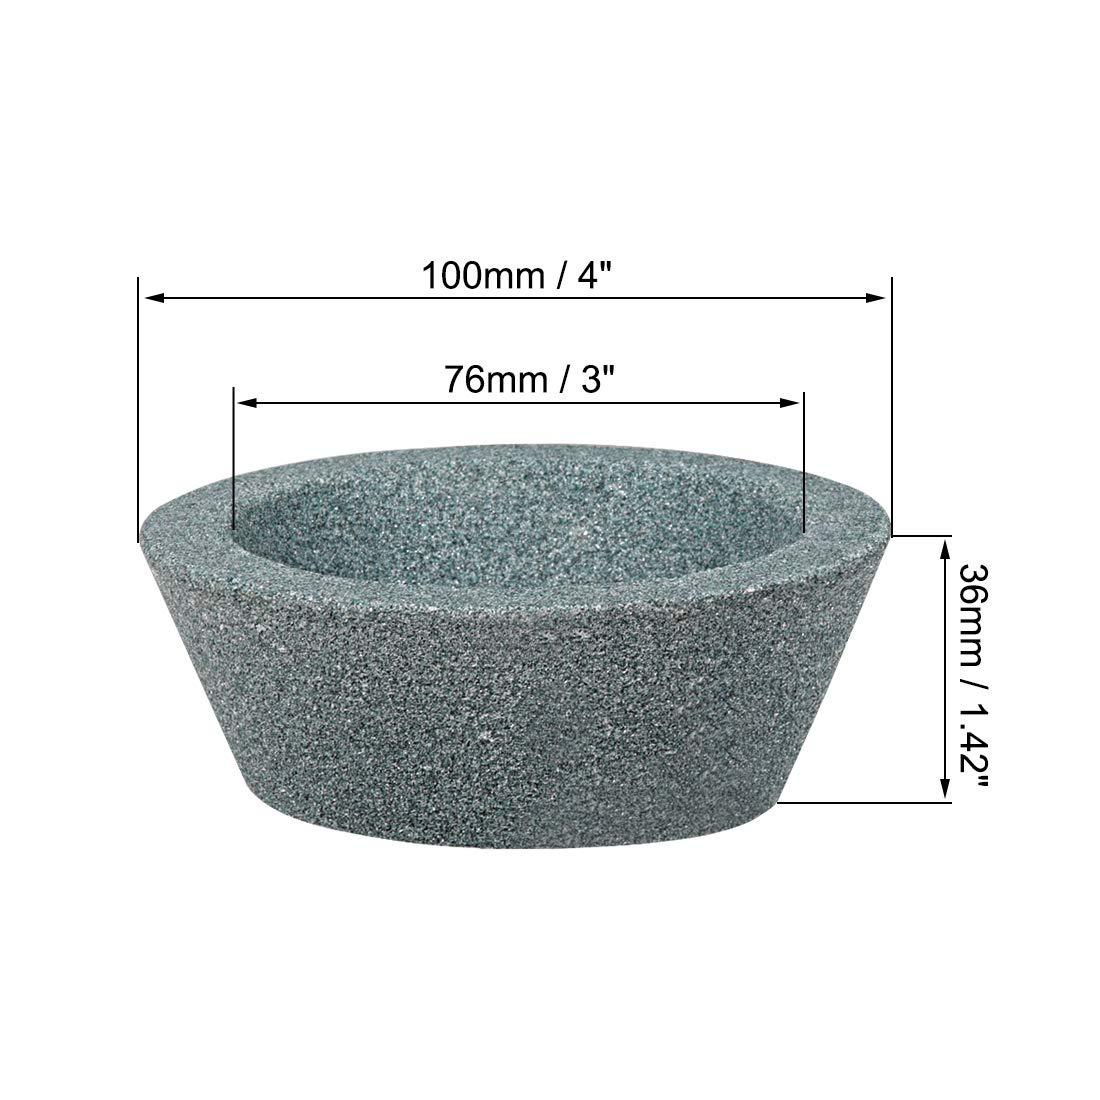 uxcell 125x10x32x4mm 180 Grit 75/% Resin Bond Diamond Grinding Wheel Grinder Plain Type